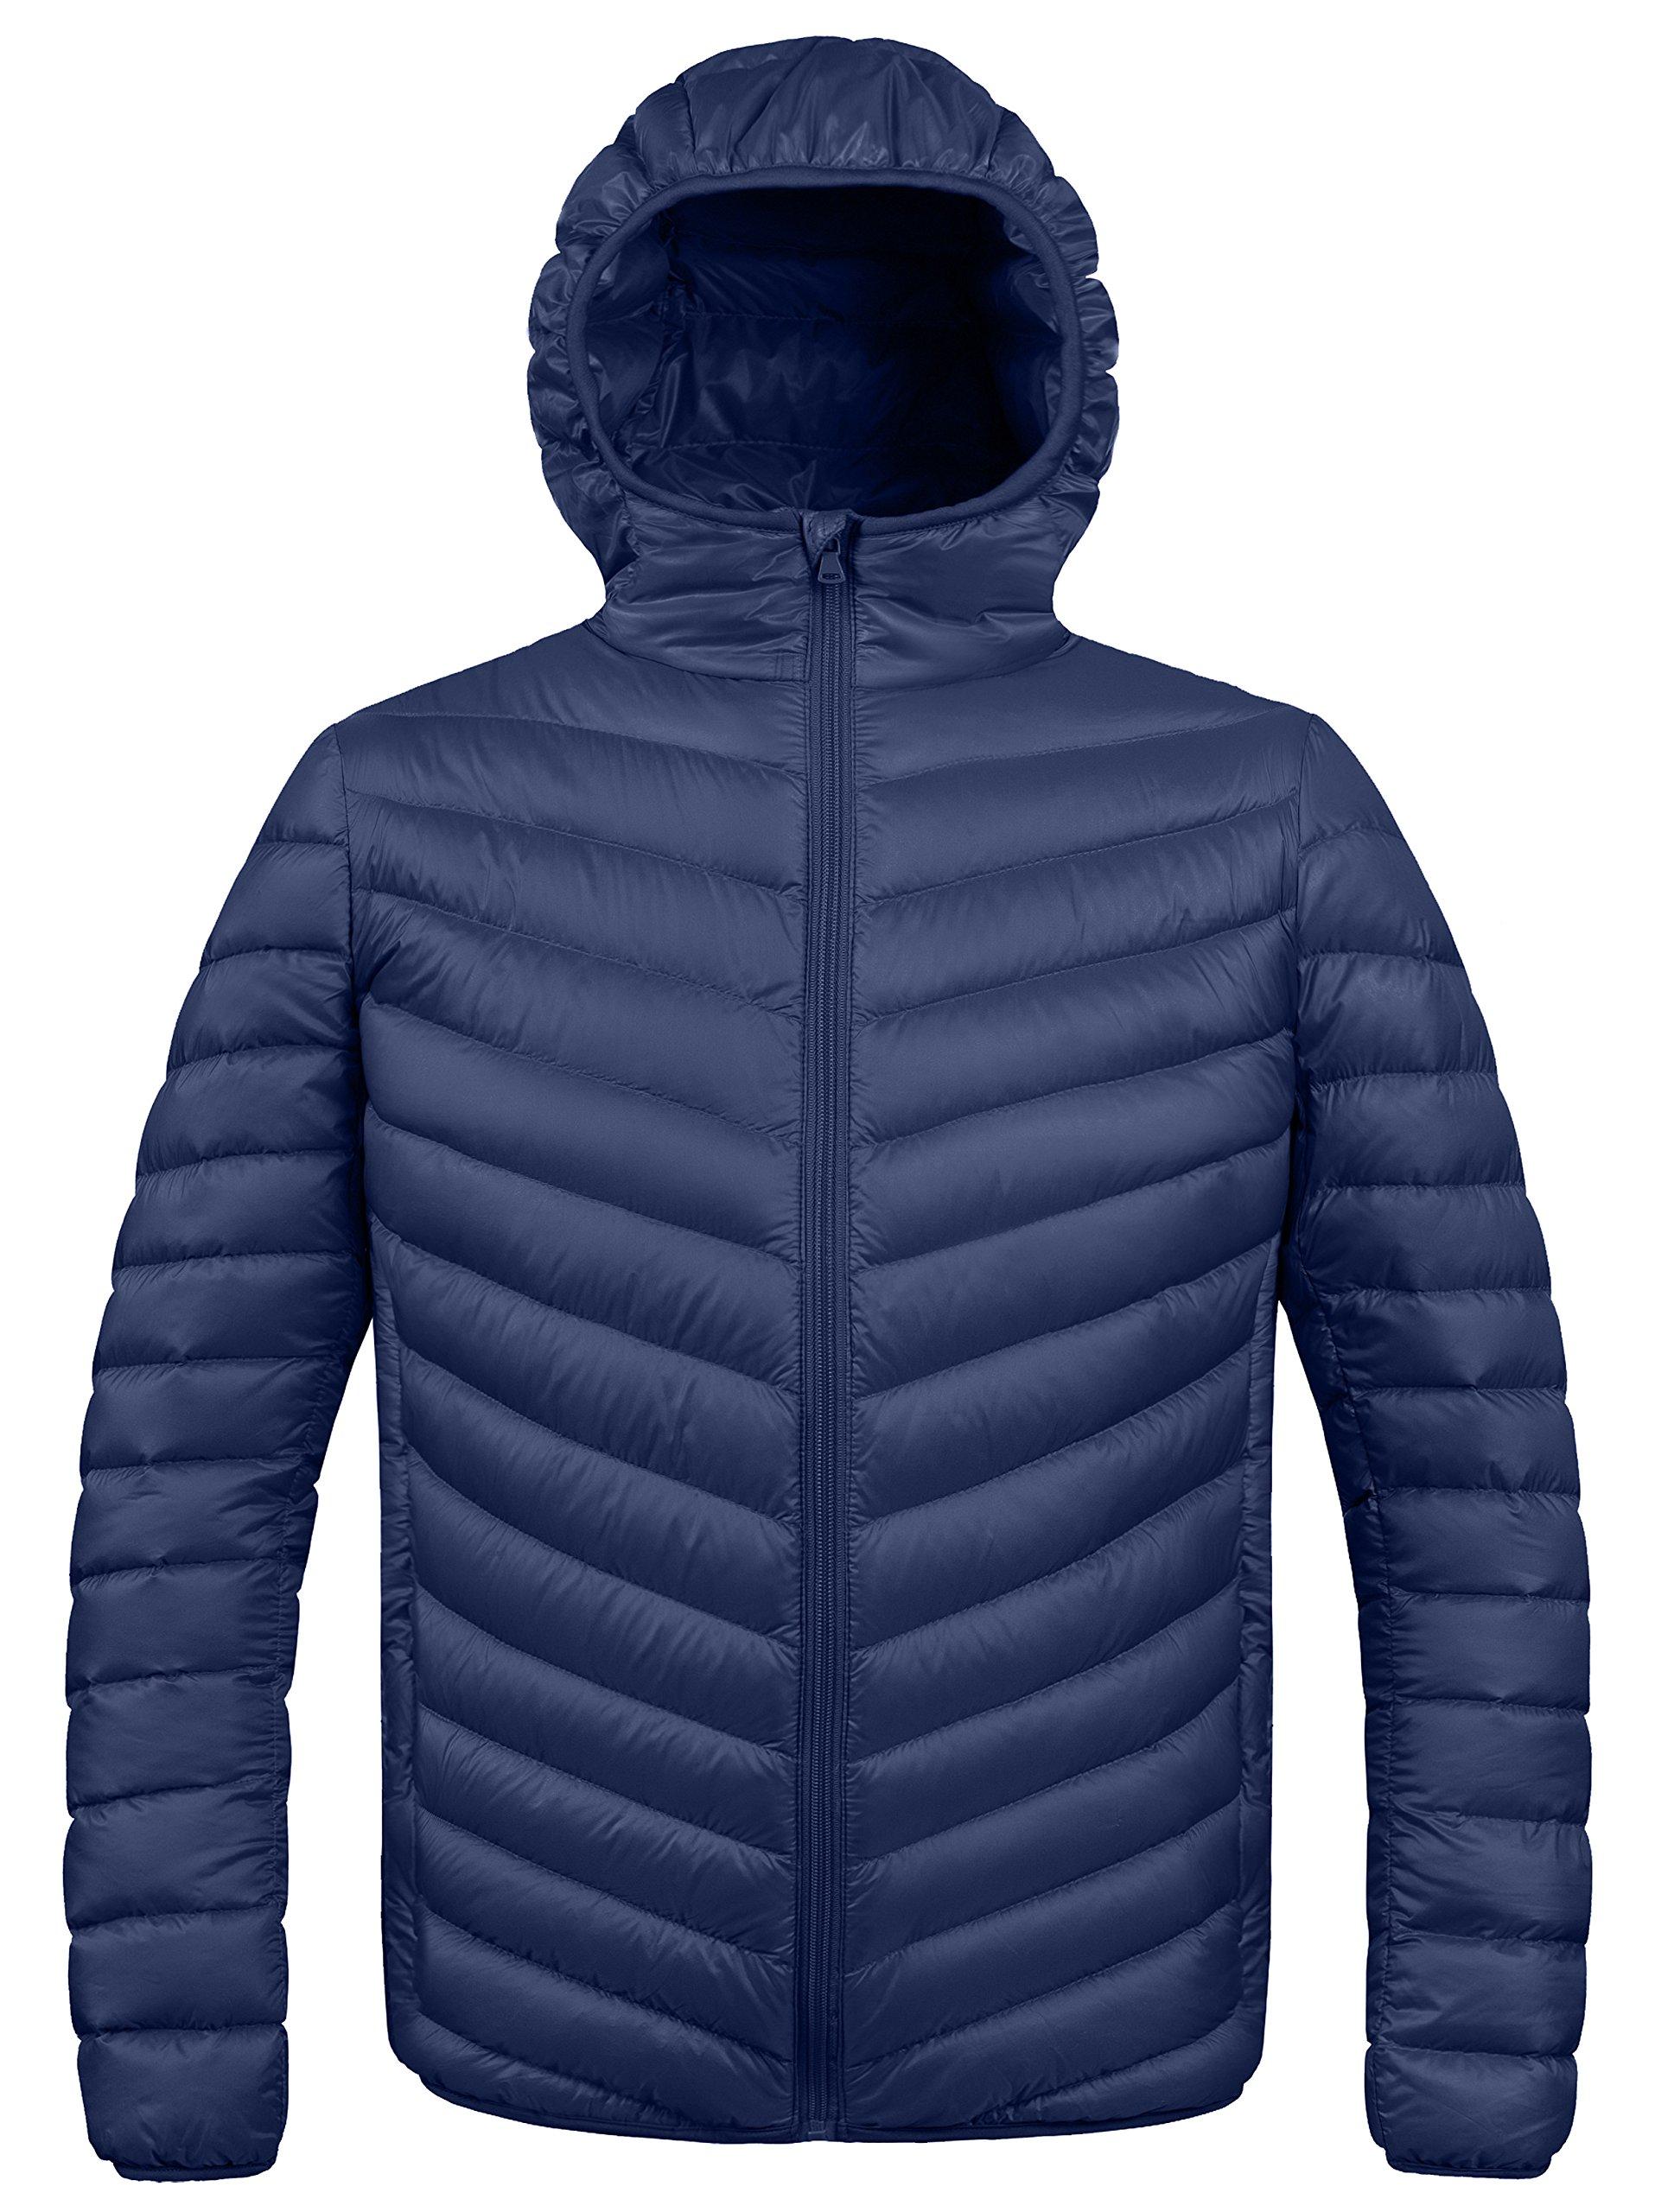 ZSHOW Men's Winter Hooded Packable Down Jacket(Navy,Medium)